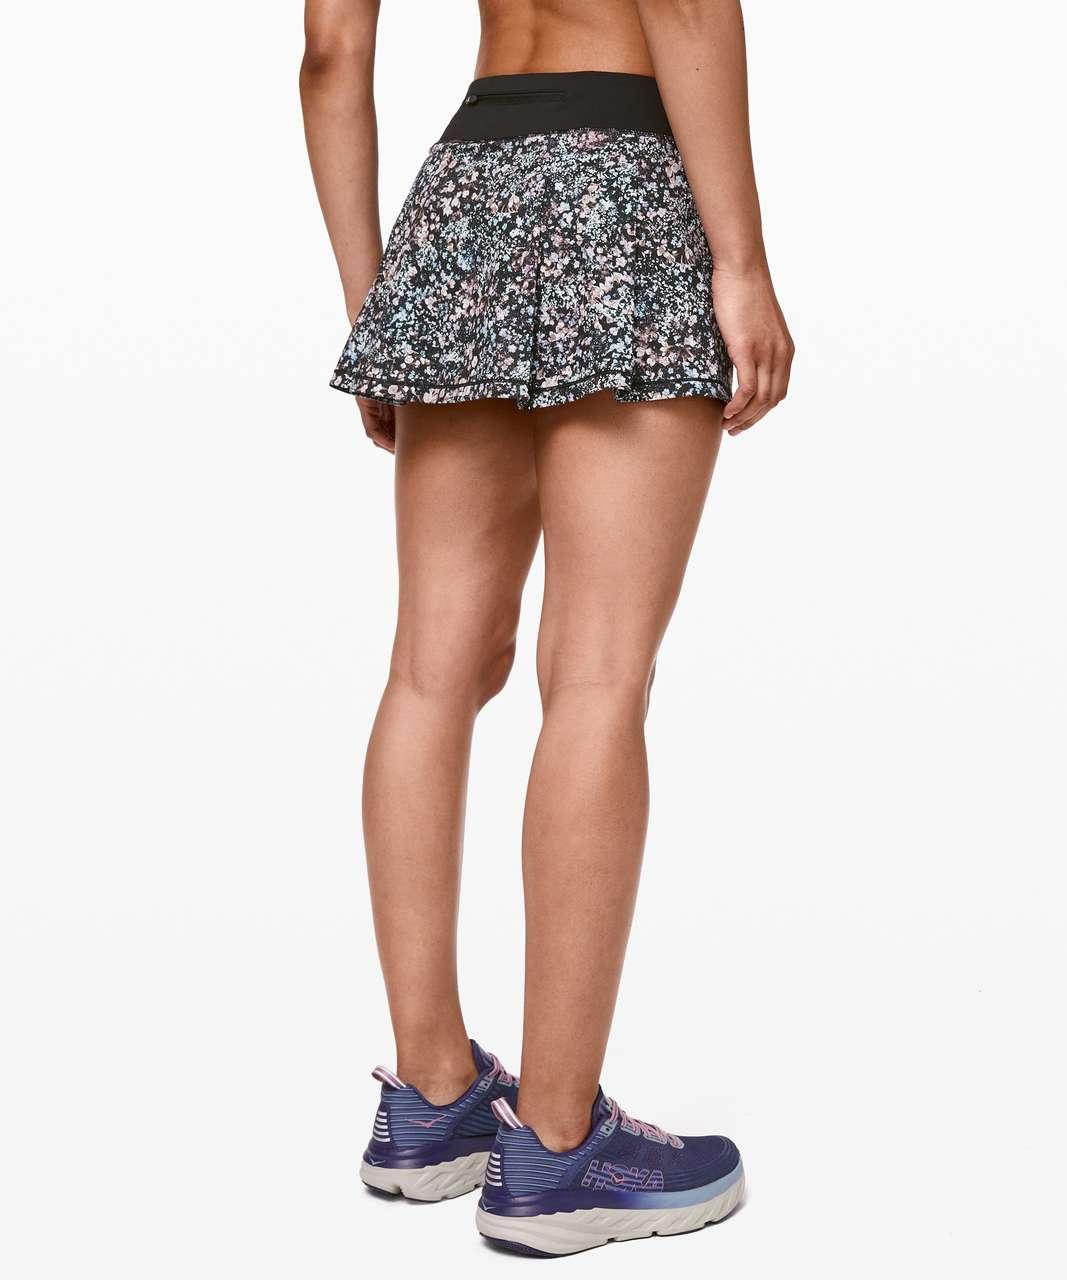 Lululemon Pace Rival Skirt II (Regular) *4-way Stretch - Floral Spritz Multi / Black